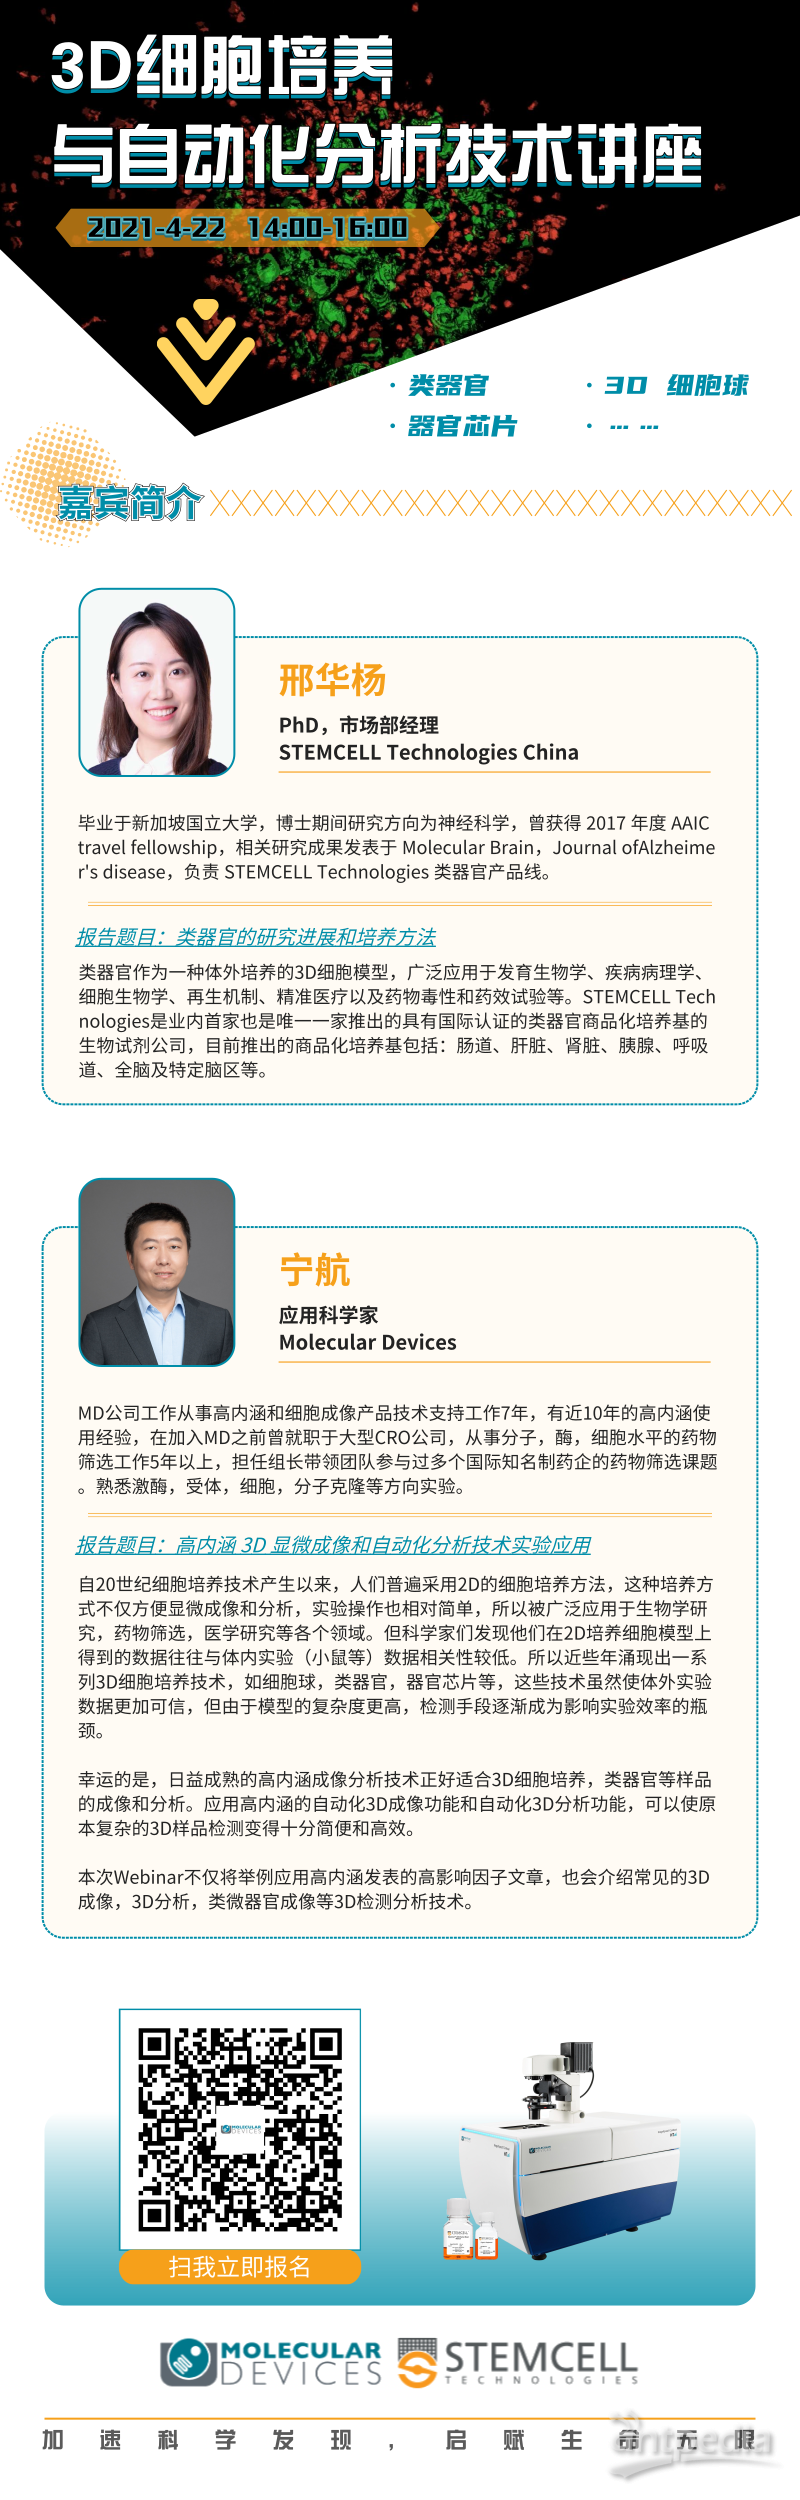 WeChat Image_20210409135025.png